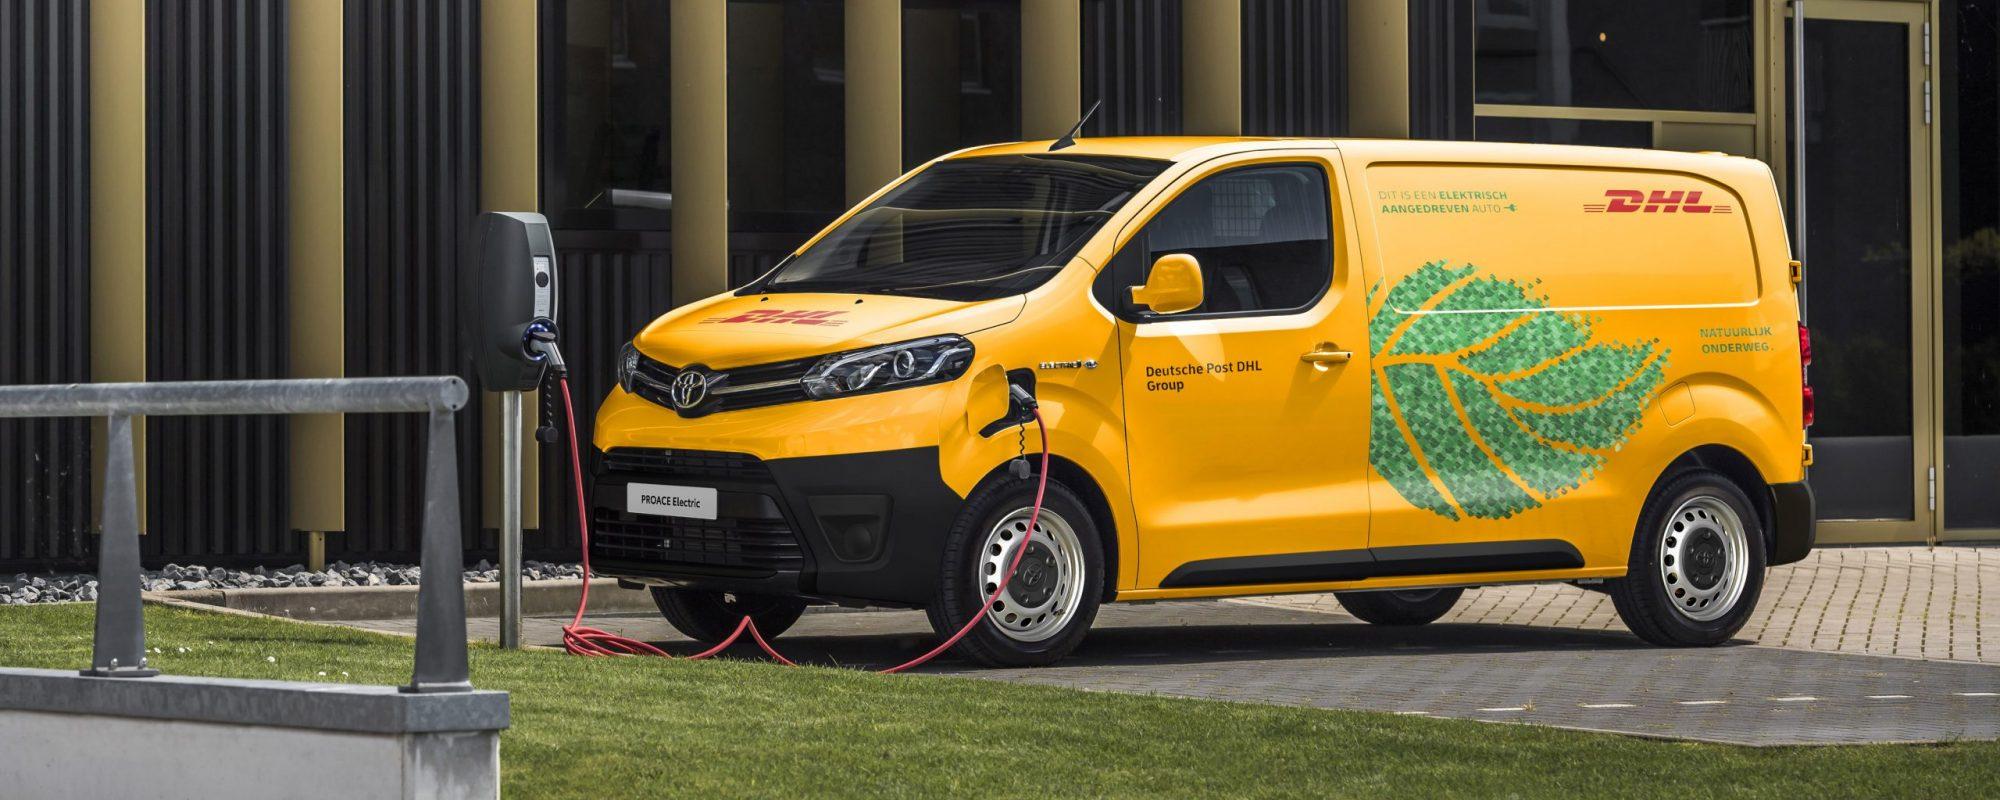 DHL Parcel kiest voor Toyota Proace Electric